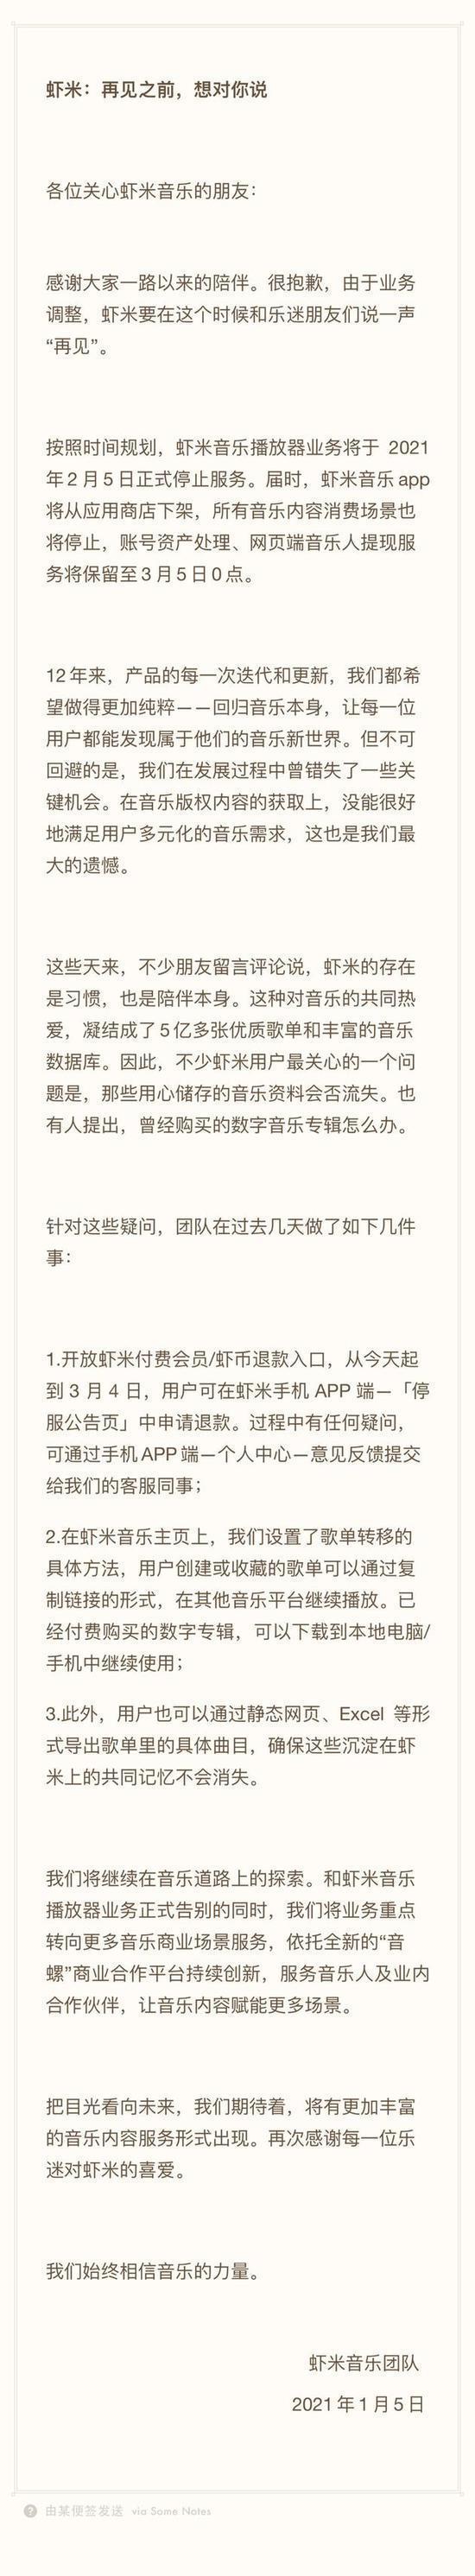 usdt自动充值(www.caibao.it):虾米音乐播放器2月5日关停 3月5日后将无法登录